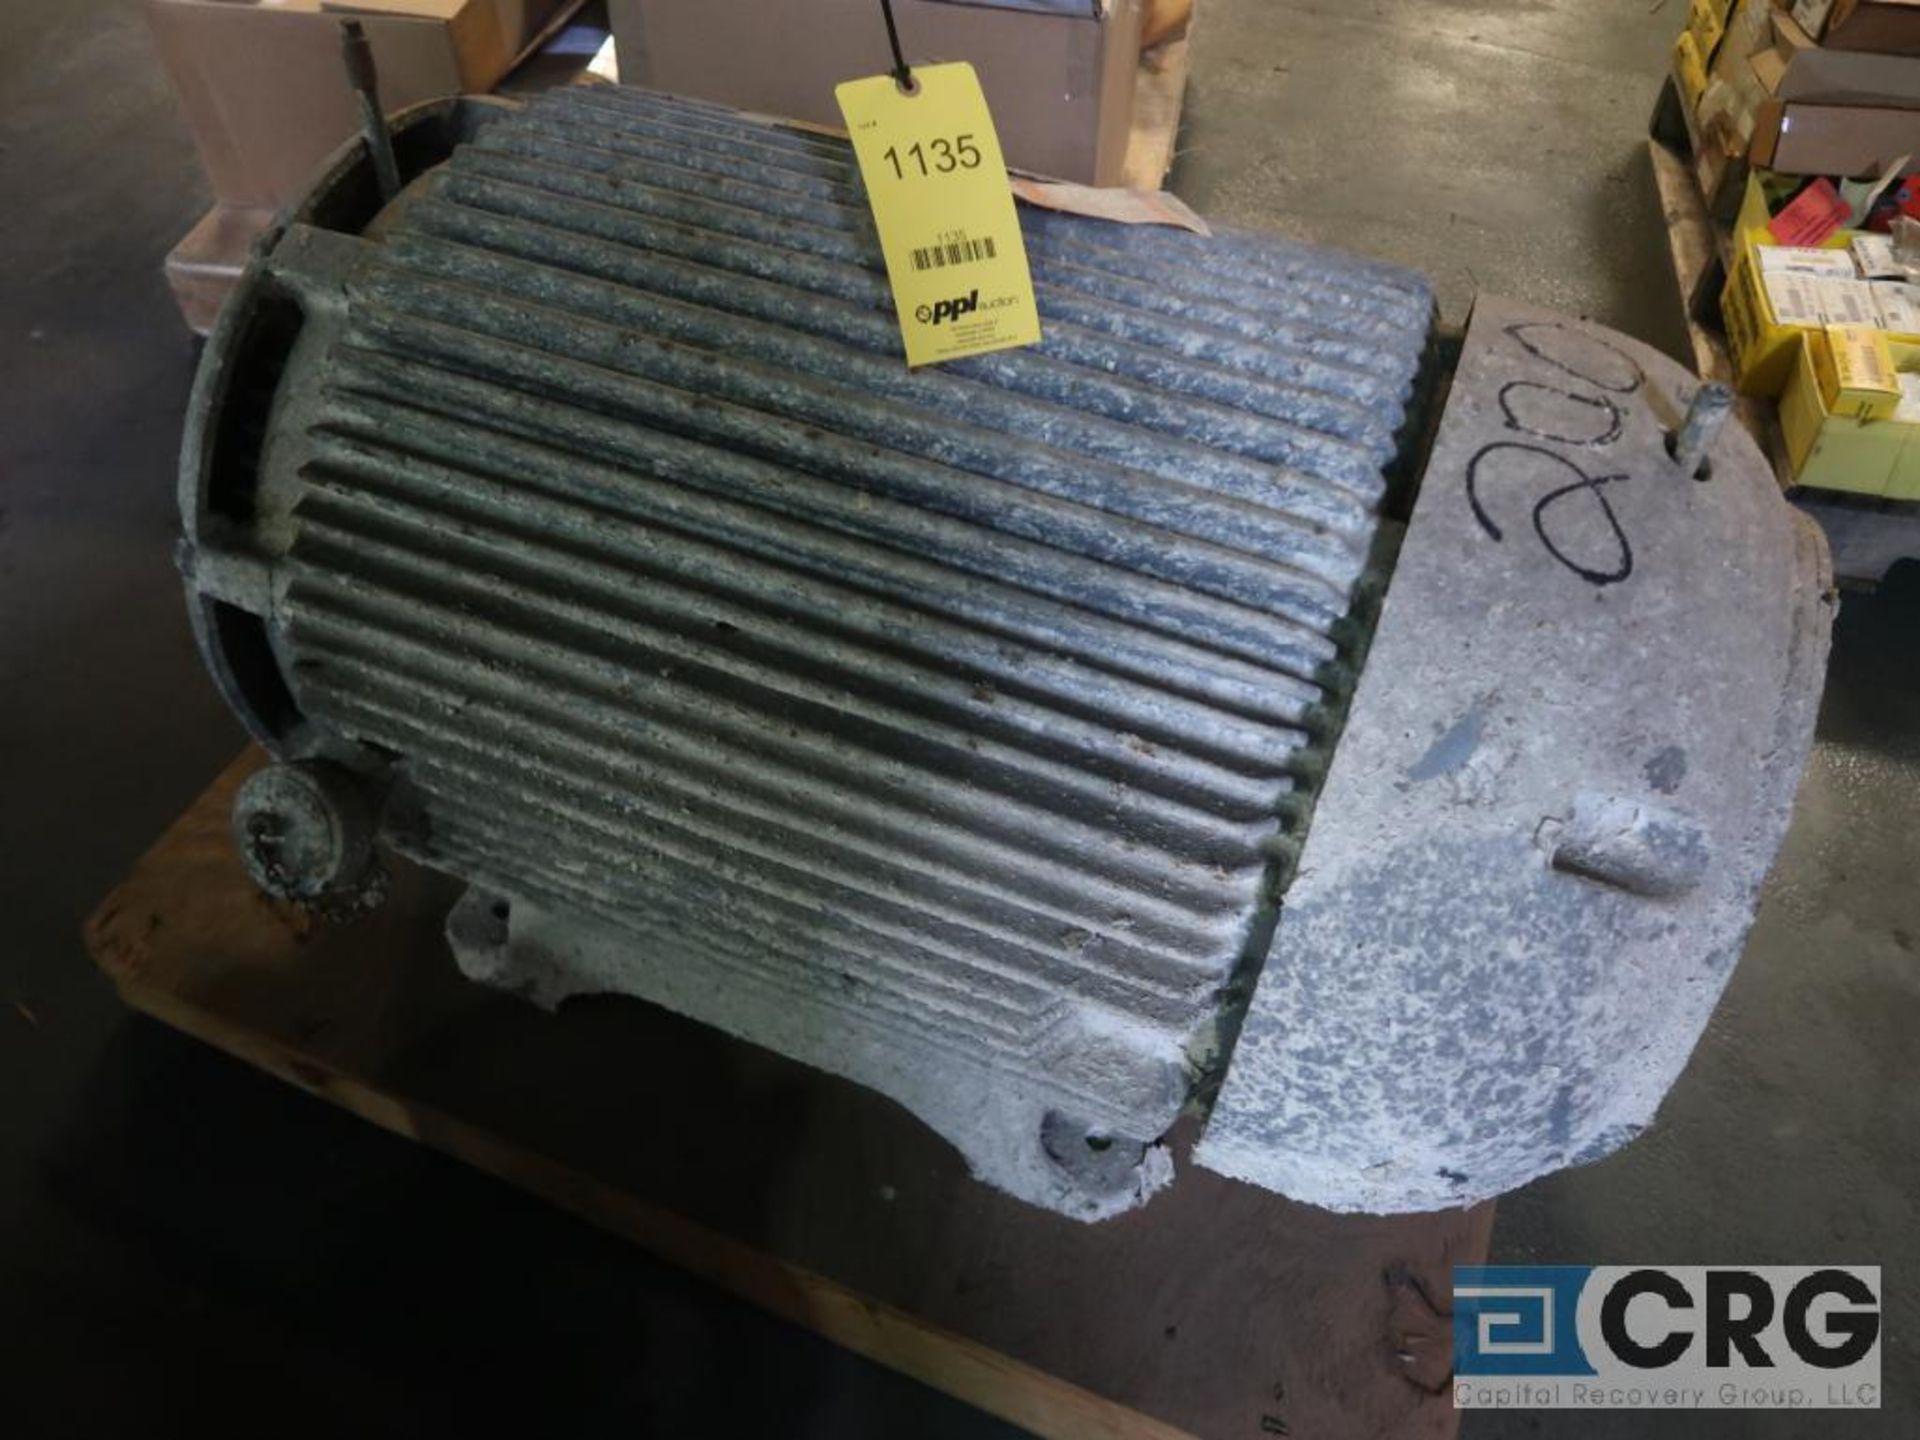 Siemens-Allis induction motor, 200 HP, 3,570 RPMs, 2,300 volt, 3 ph., 447TS frame (Finish Building)